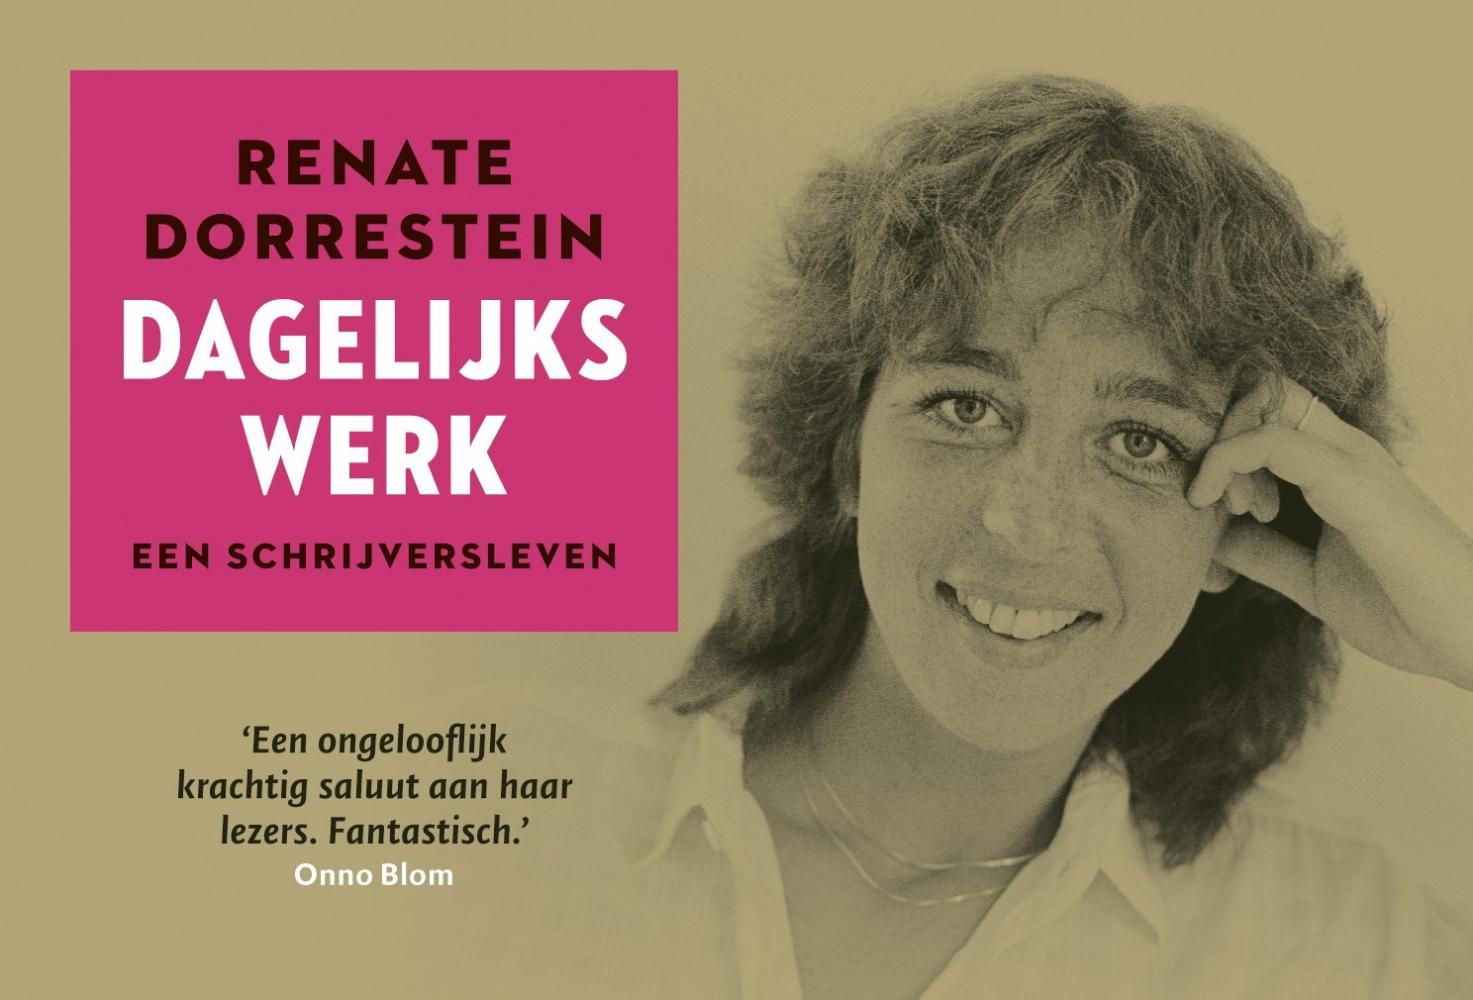 Renate Dorrestein,Dagelijks werk